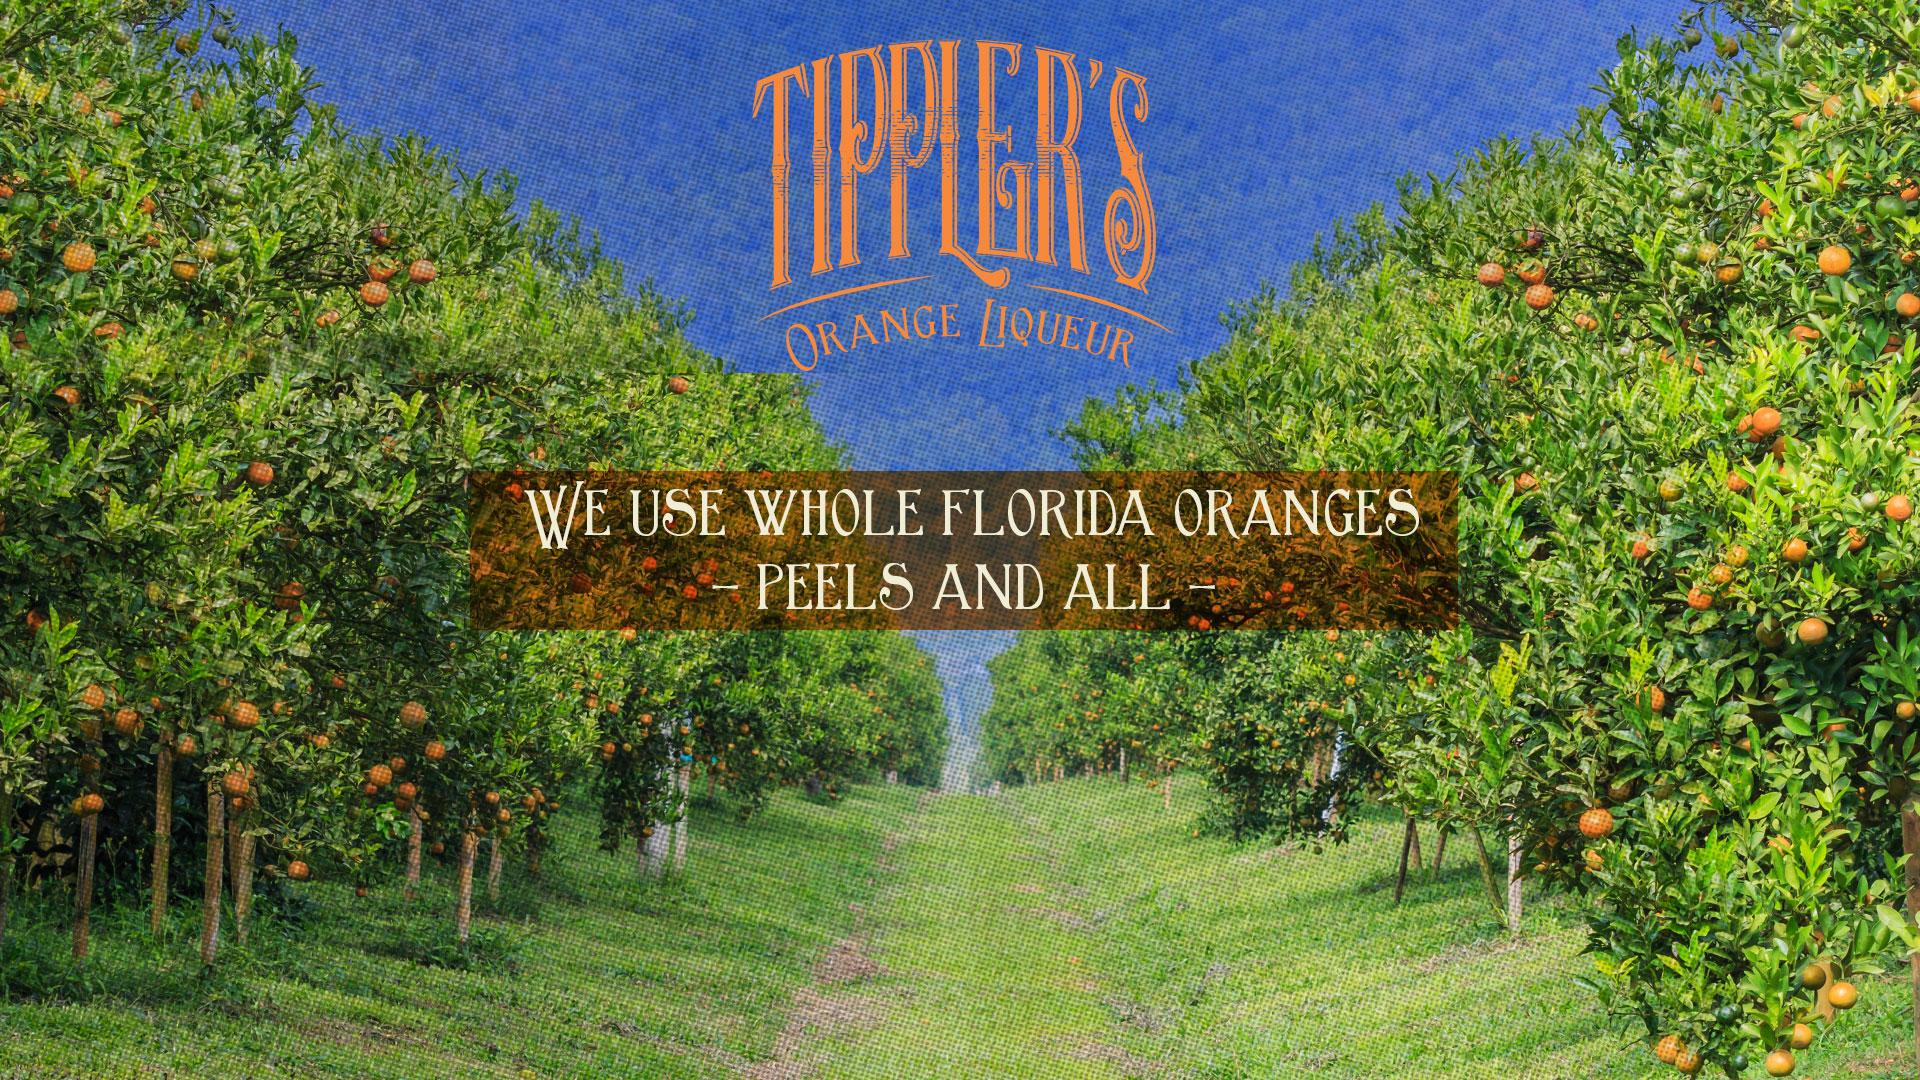 Tipplers Orange Liqueur